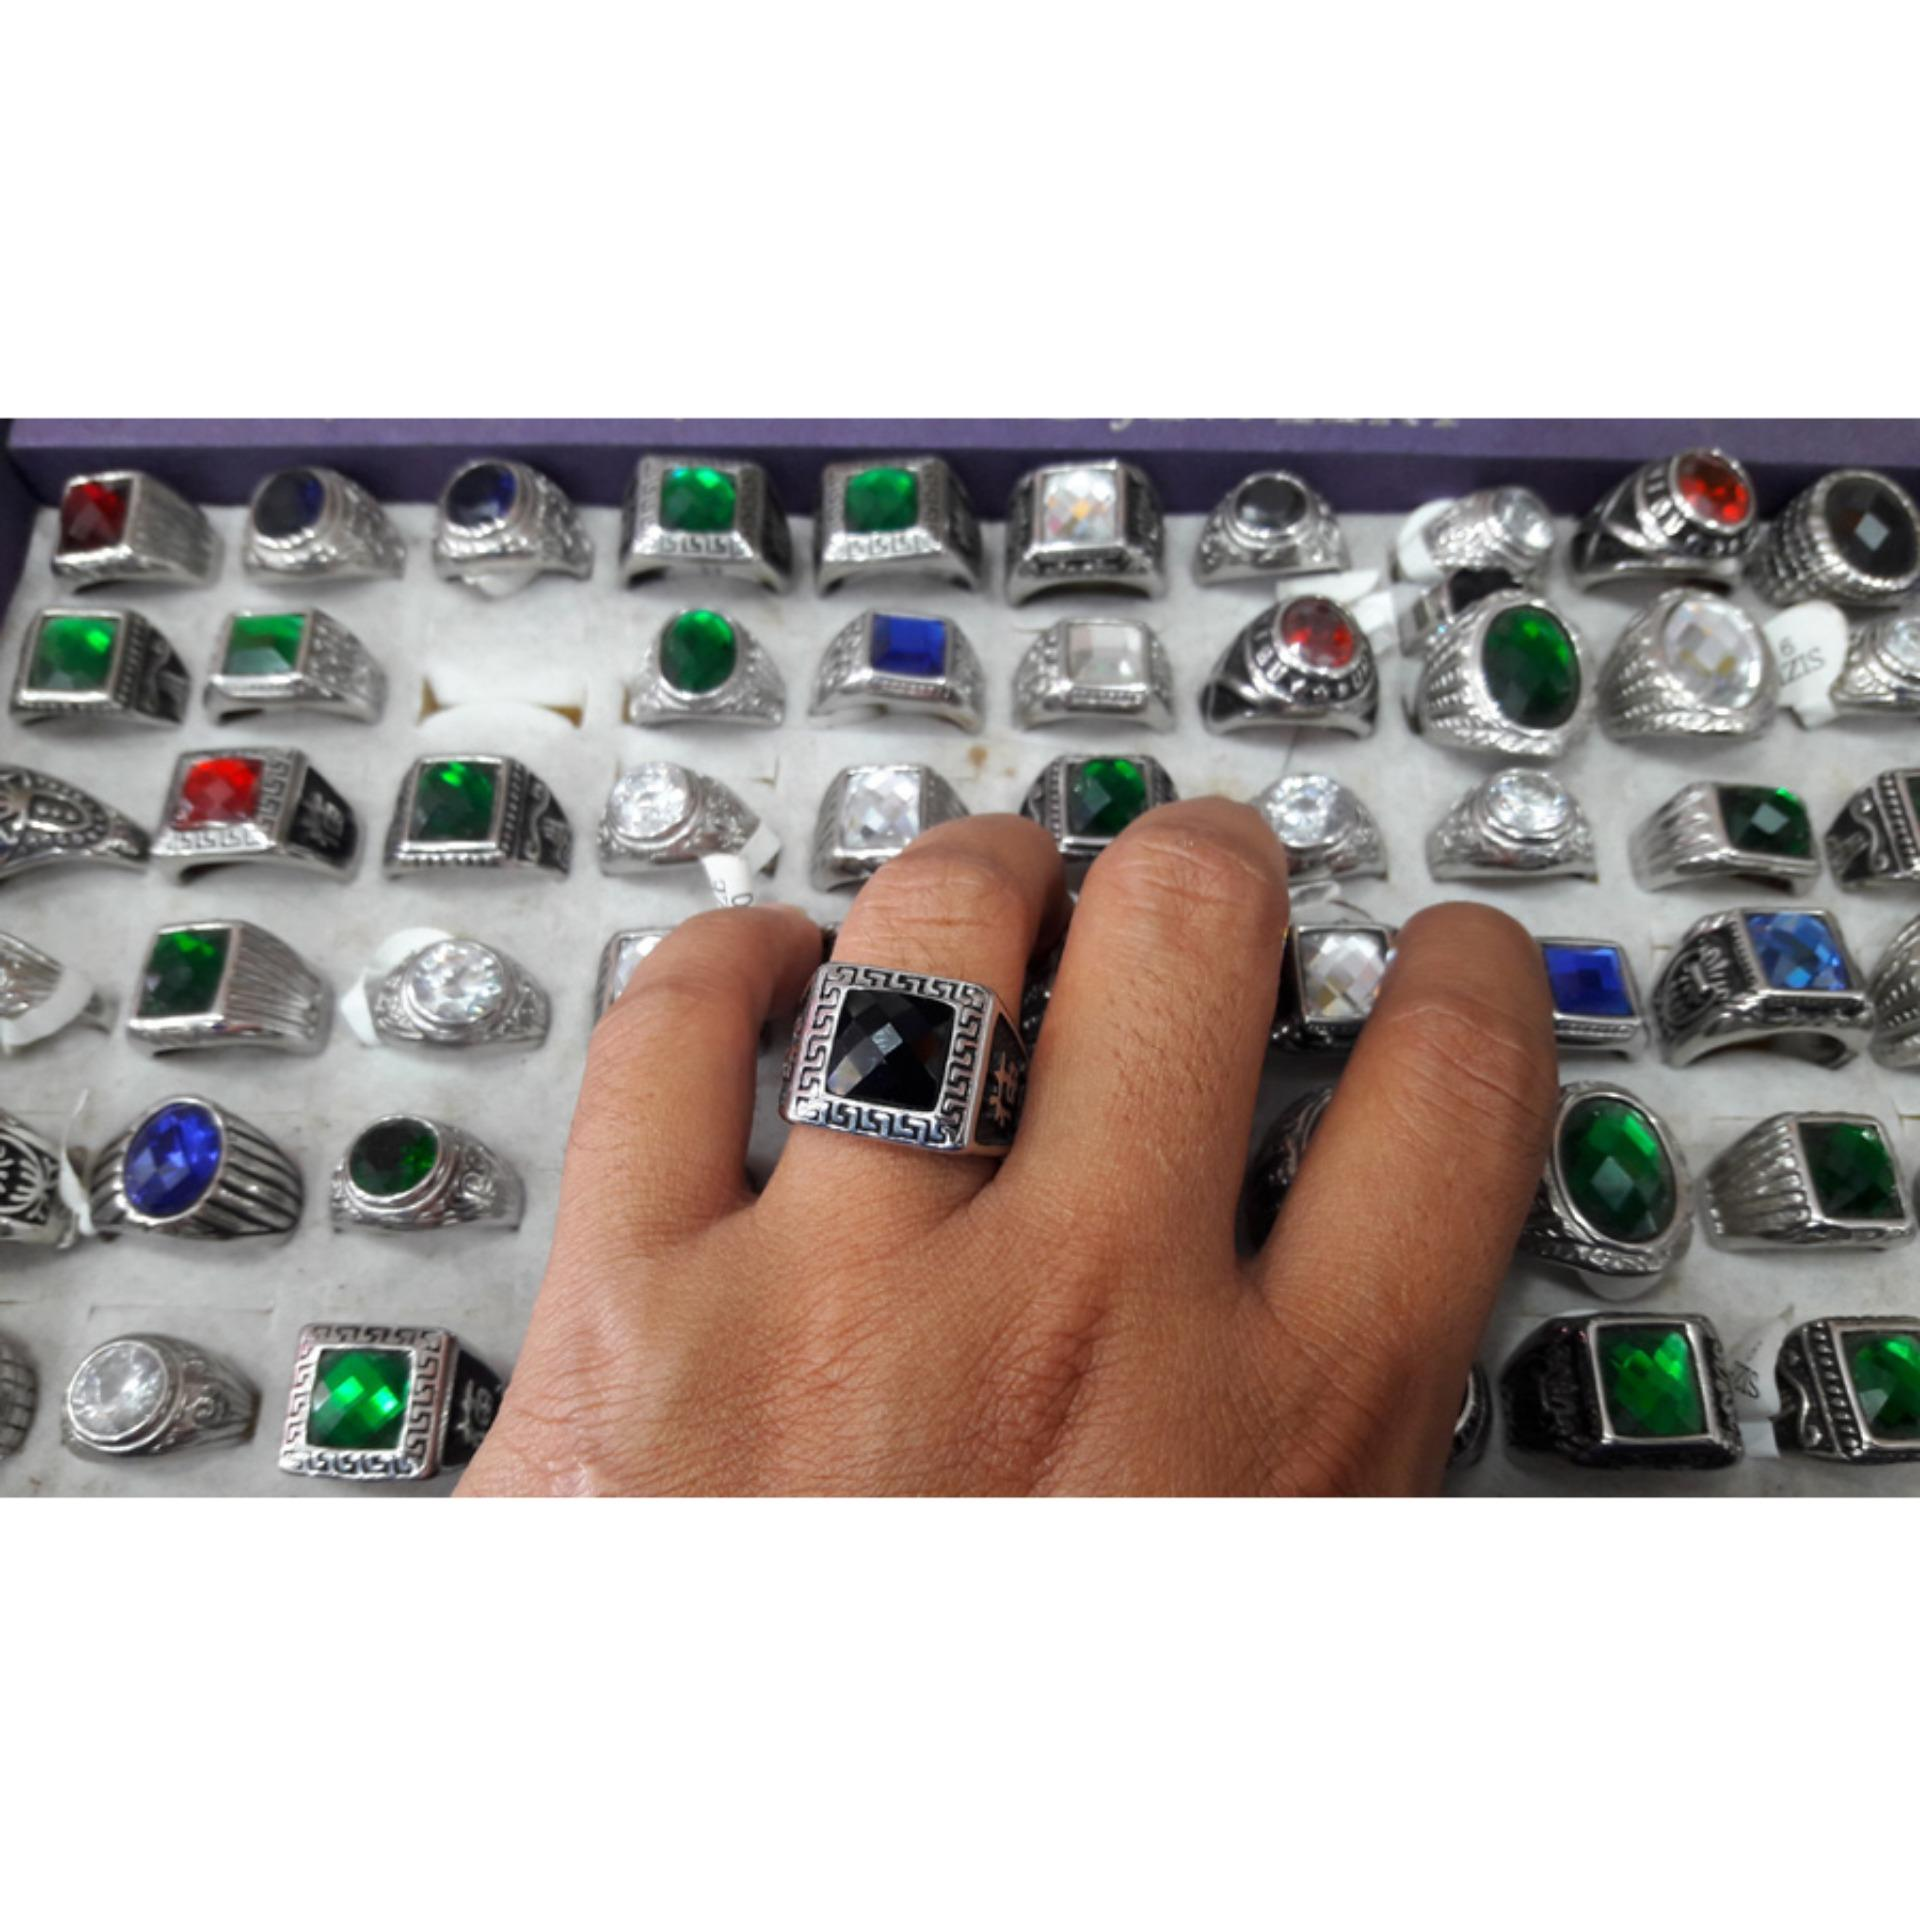 Spesifikasi Handmade Nandhut Cincin Akik Kotak Silver Paling Bagus